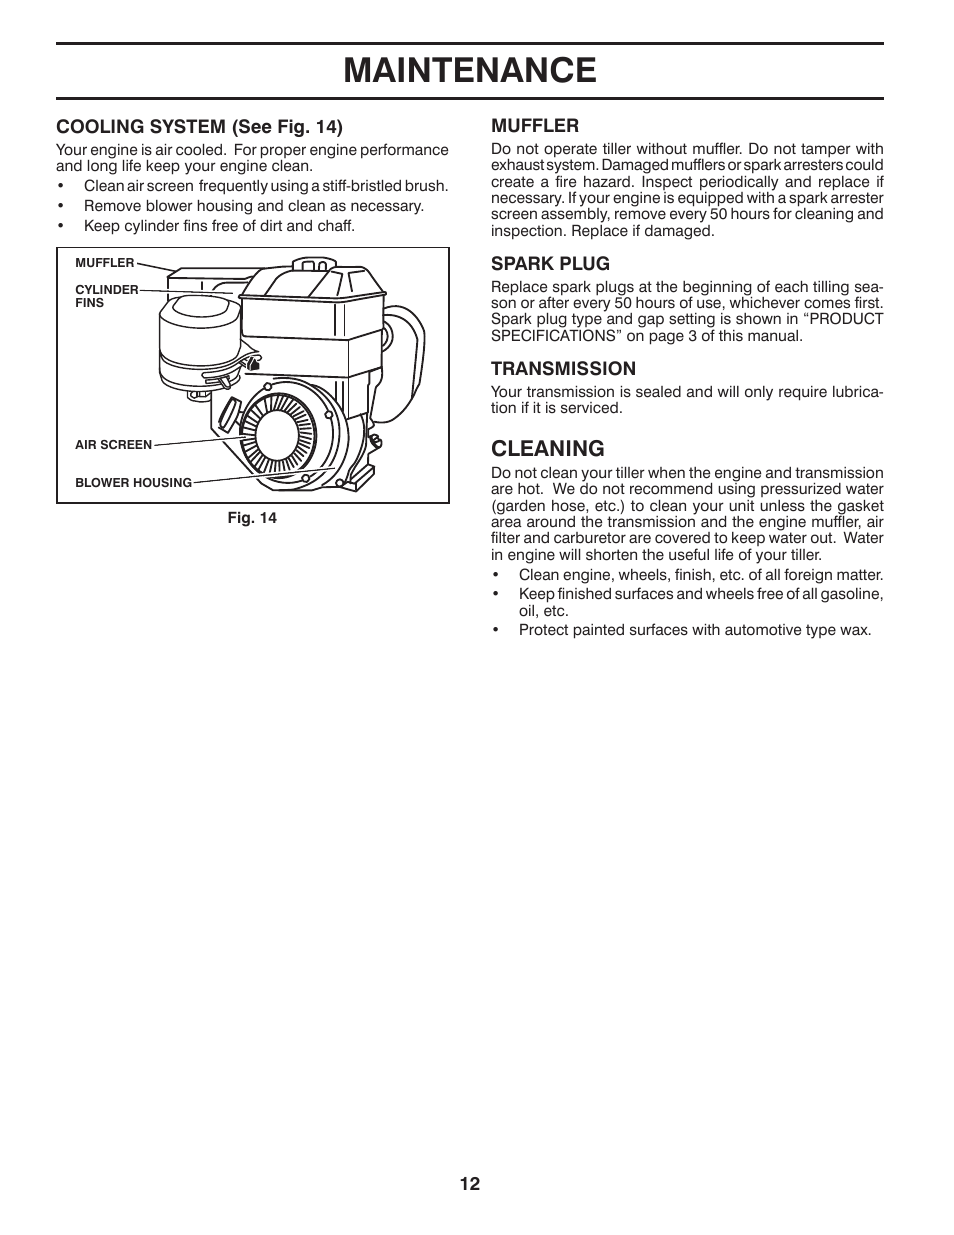 Maintenance Cleaning Poulan Pro Hdf900 Front Tine Tiller Manuel D Engine Diagram Dutilisation Page 12 36